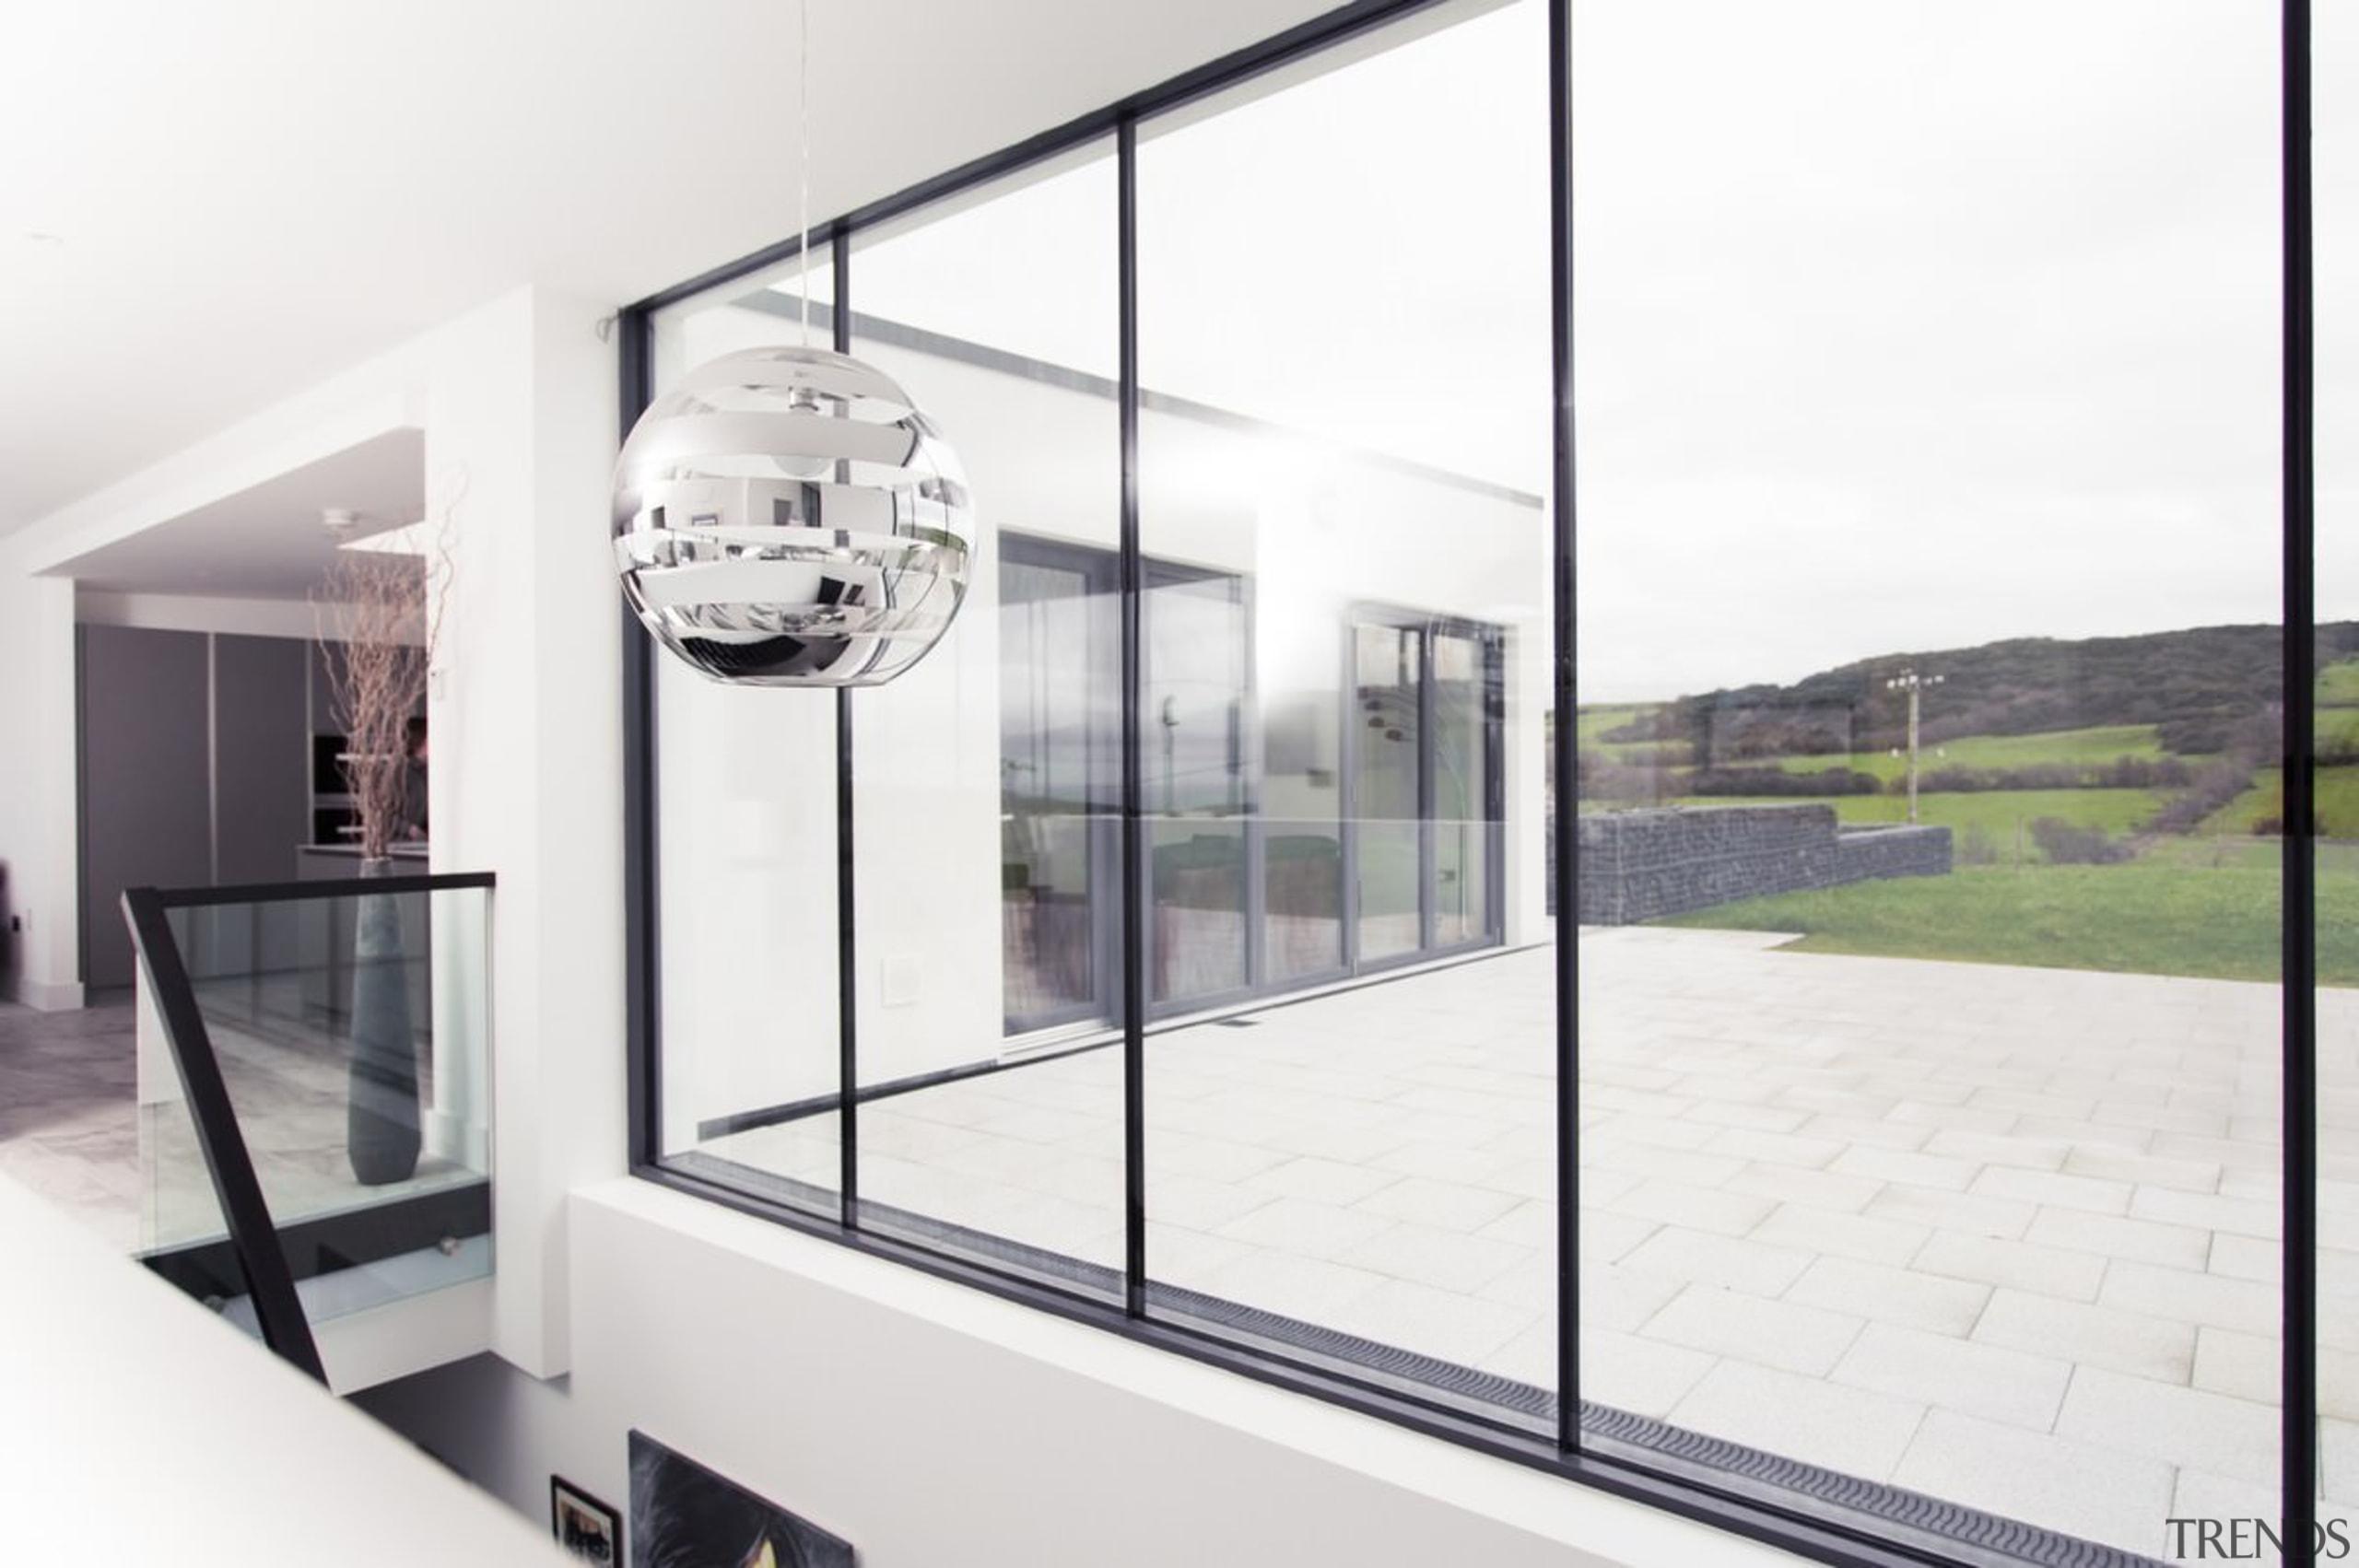 Architect: 2020 ArchitectsPhotography by Reinis Babrovskis architecture, glass, house, interior design, window, white